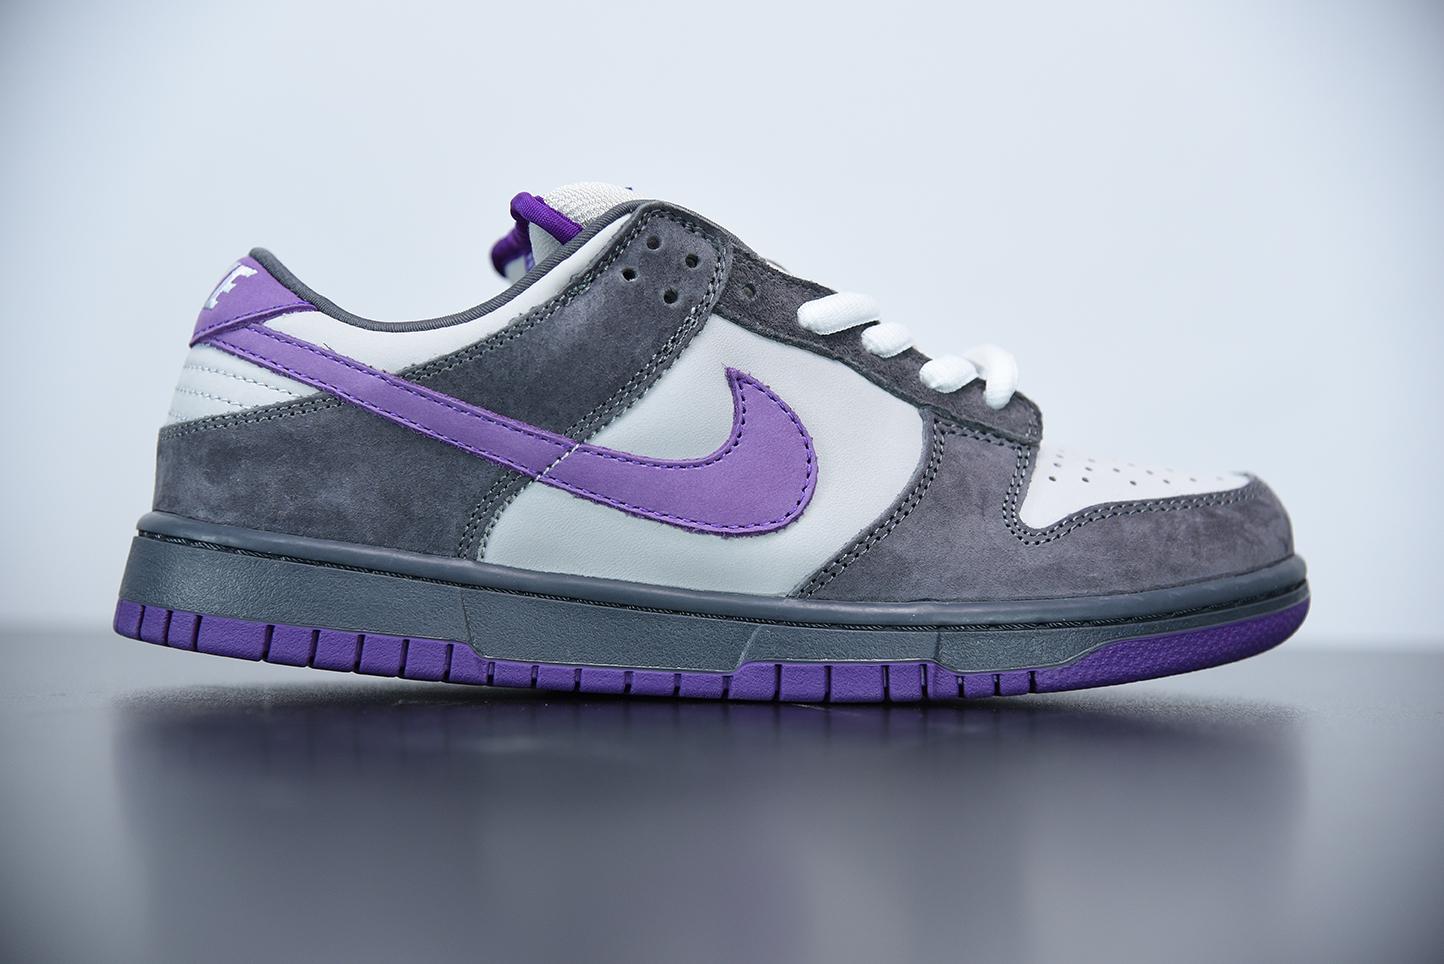 "D00Y6 纯原 SB板鞋 紫鸽子 灰紫色  外贸版本  NK Dunk Low Pro SB ""Purple Pigeon""紫鸽子  货号: 304292-051 尺码:36-47.5"